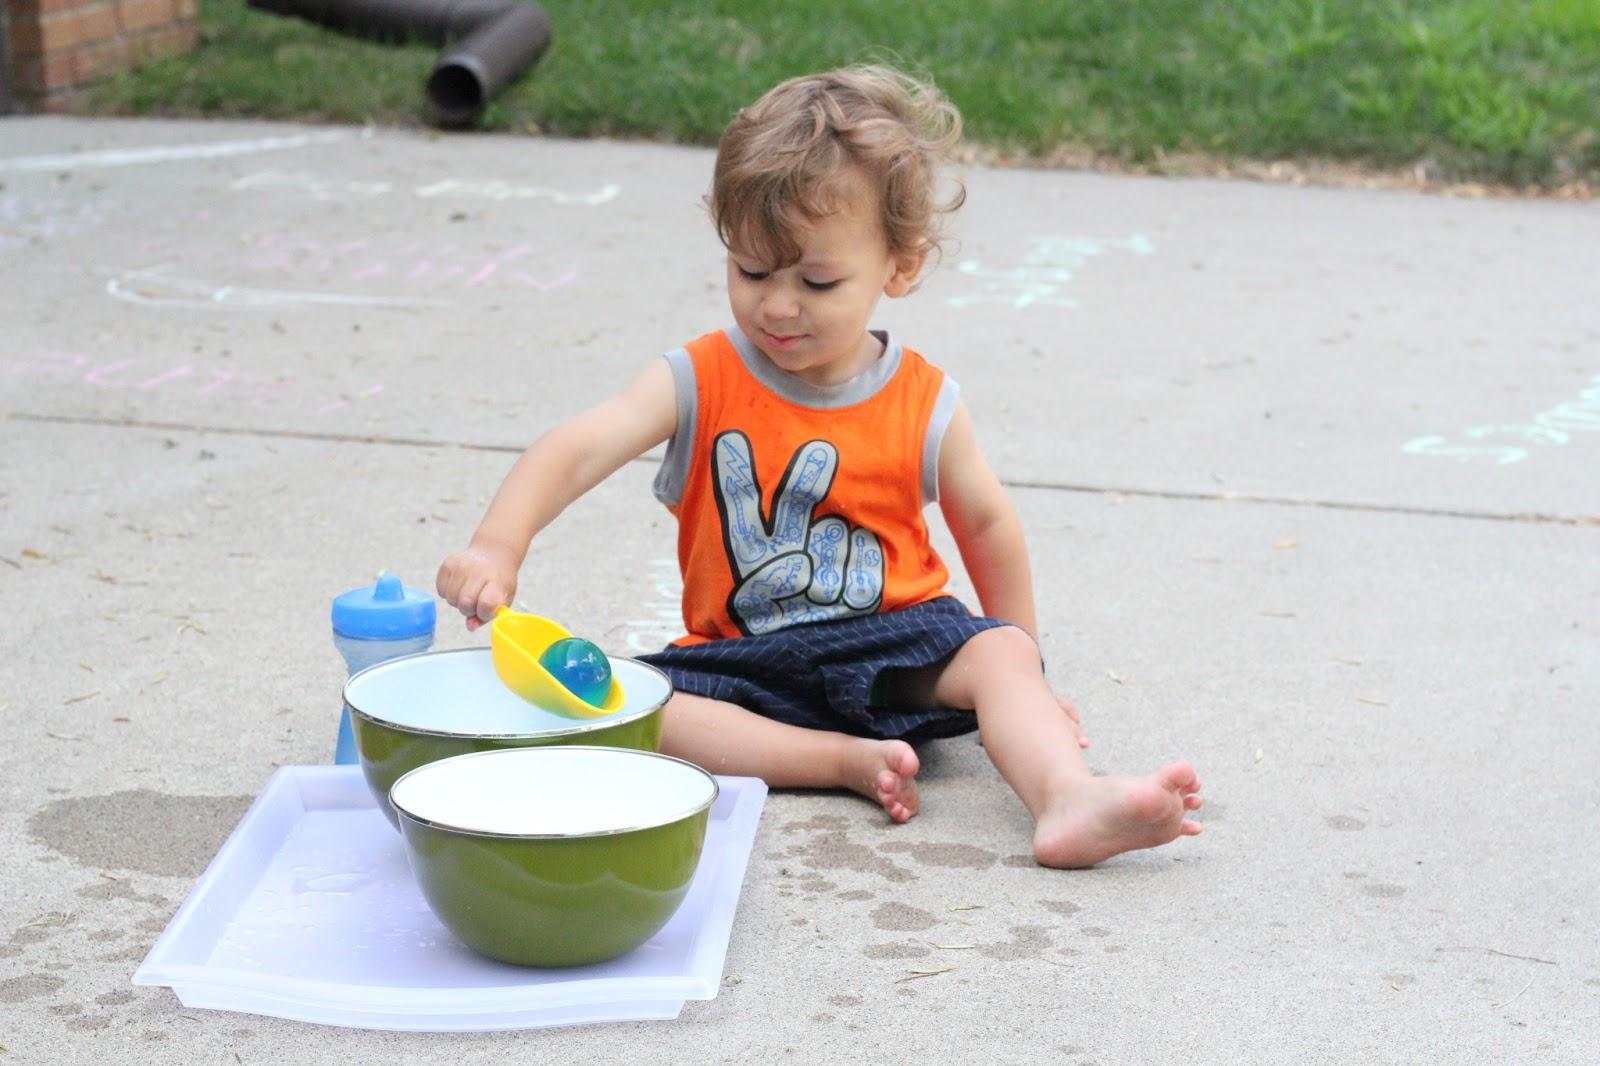 wet-silkxx.com yarina #23 Wet Silkxx Bd Company 14 Picture